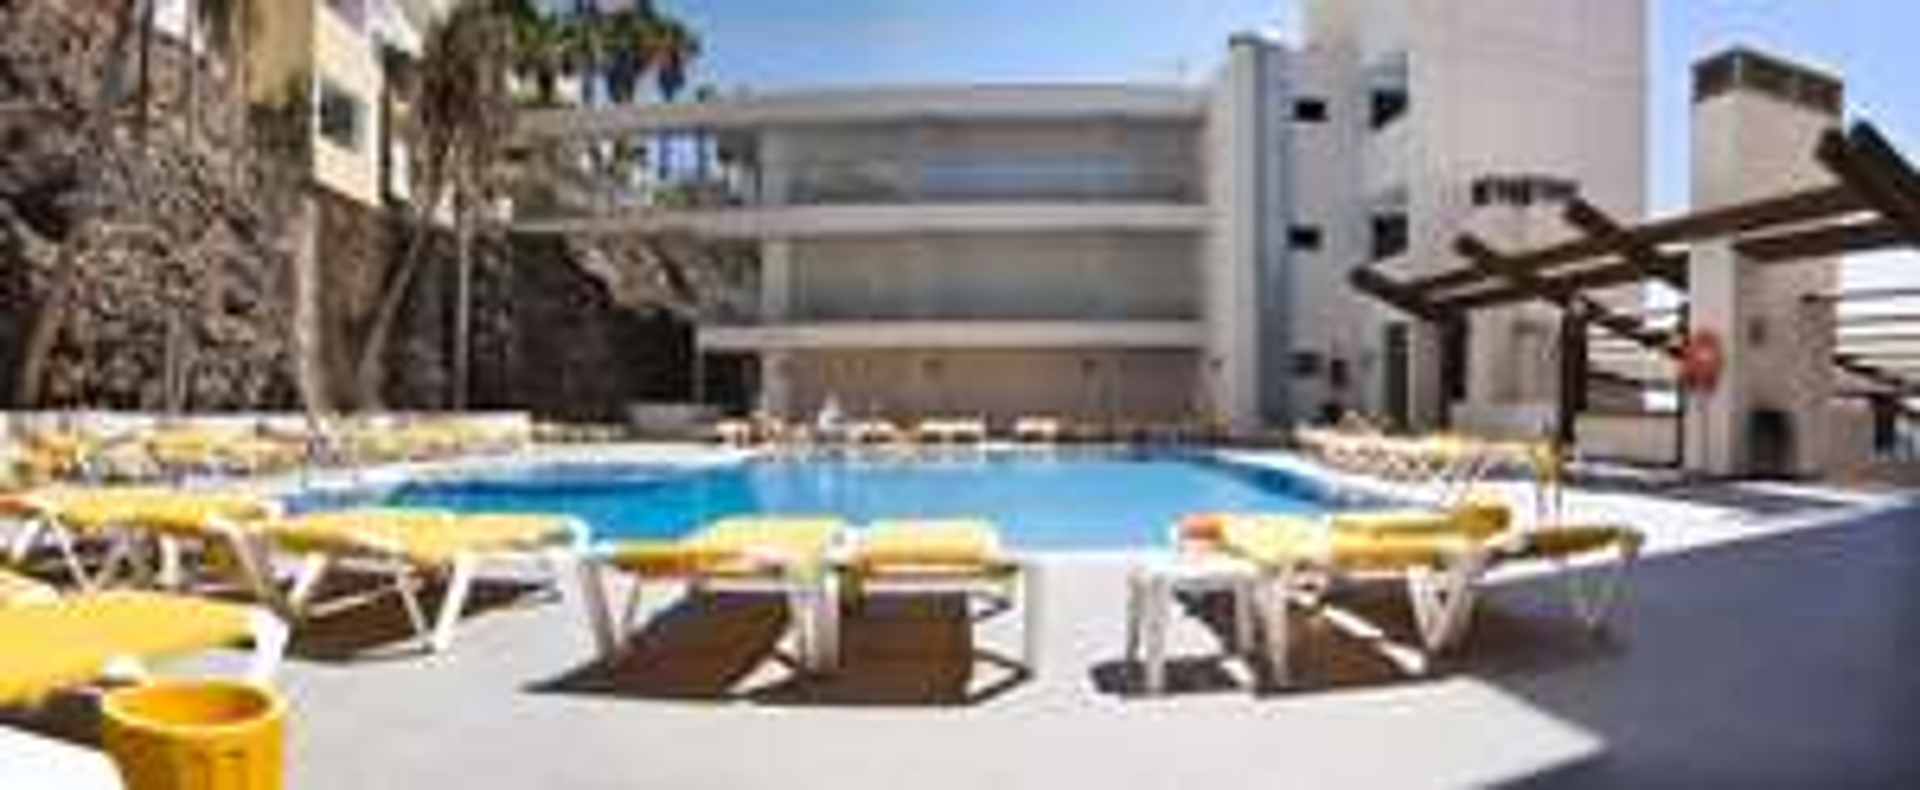 Fuerteventura: 7 Tage im 3* Hotel inkl. Flug, Rail&Fly und Transfer ab 363€